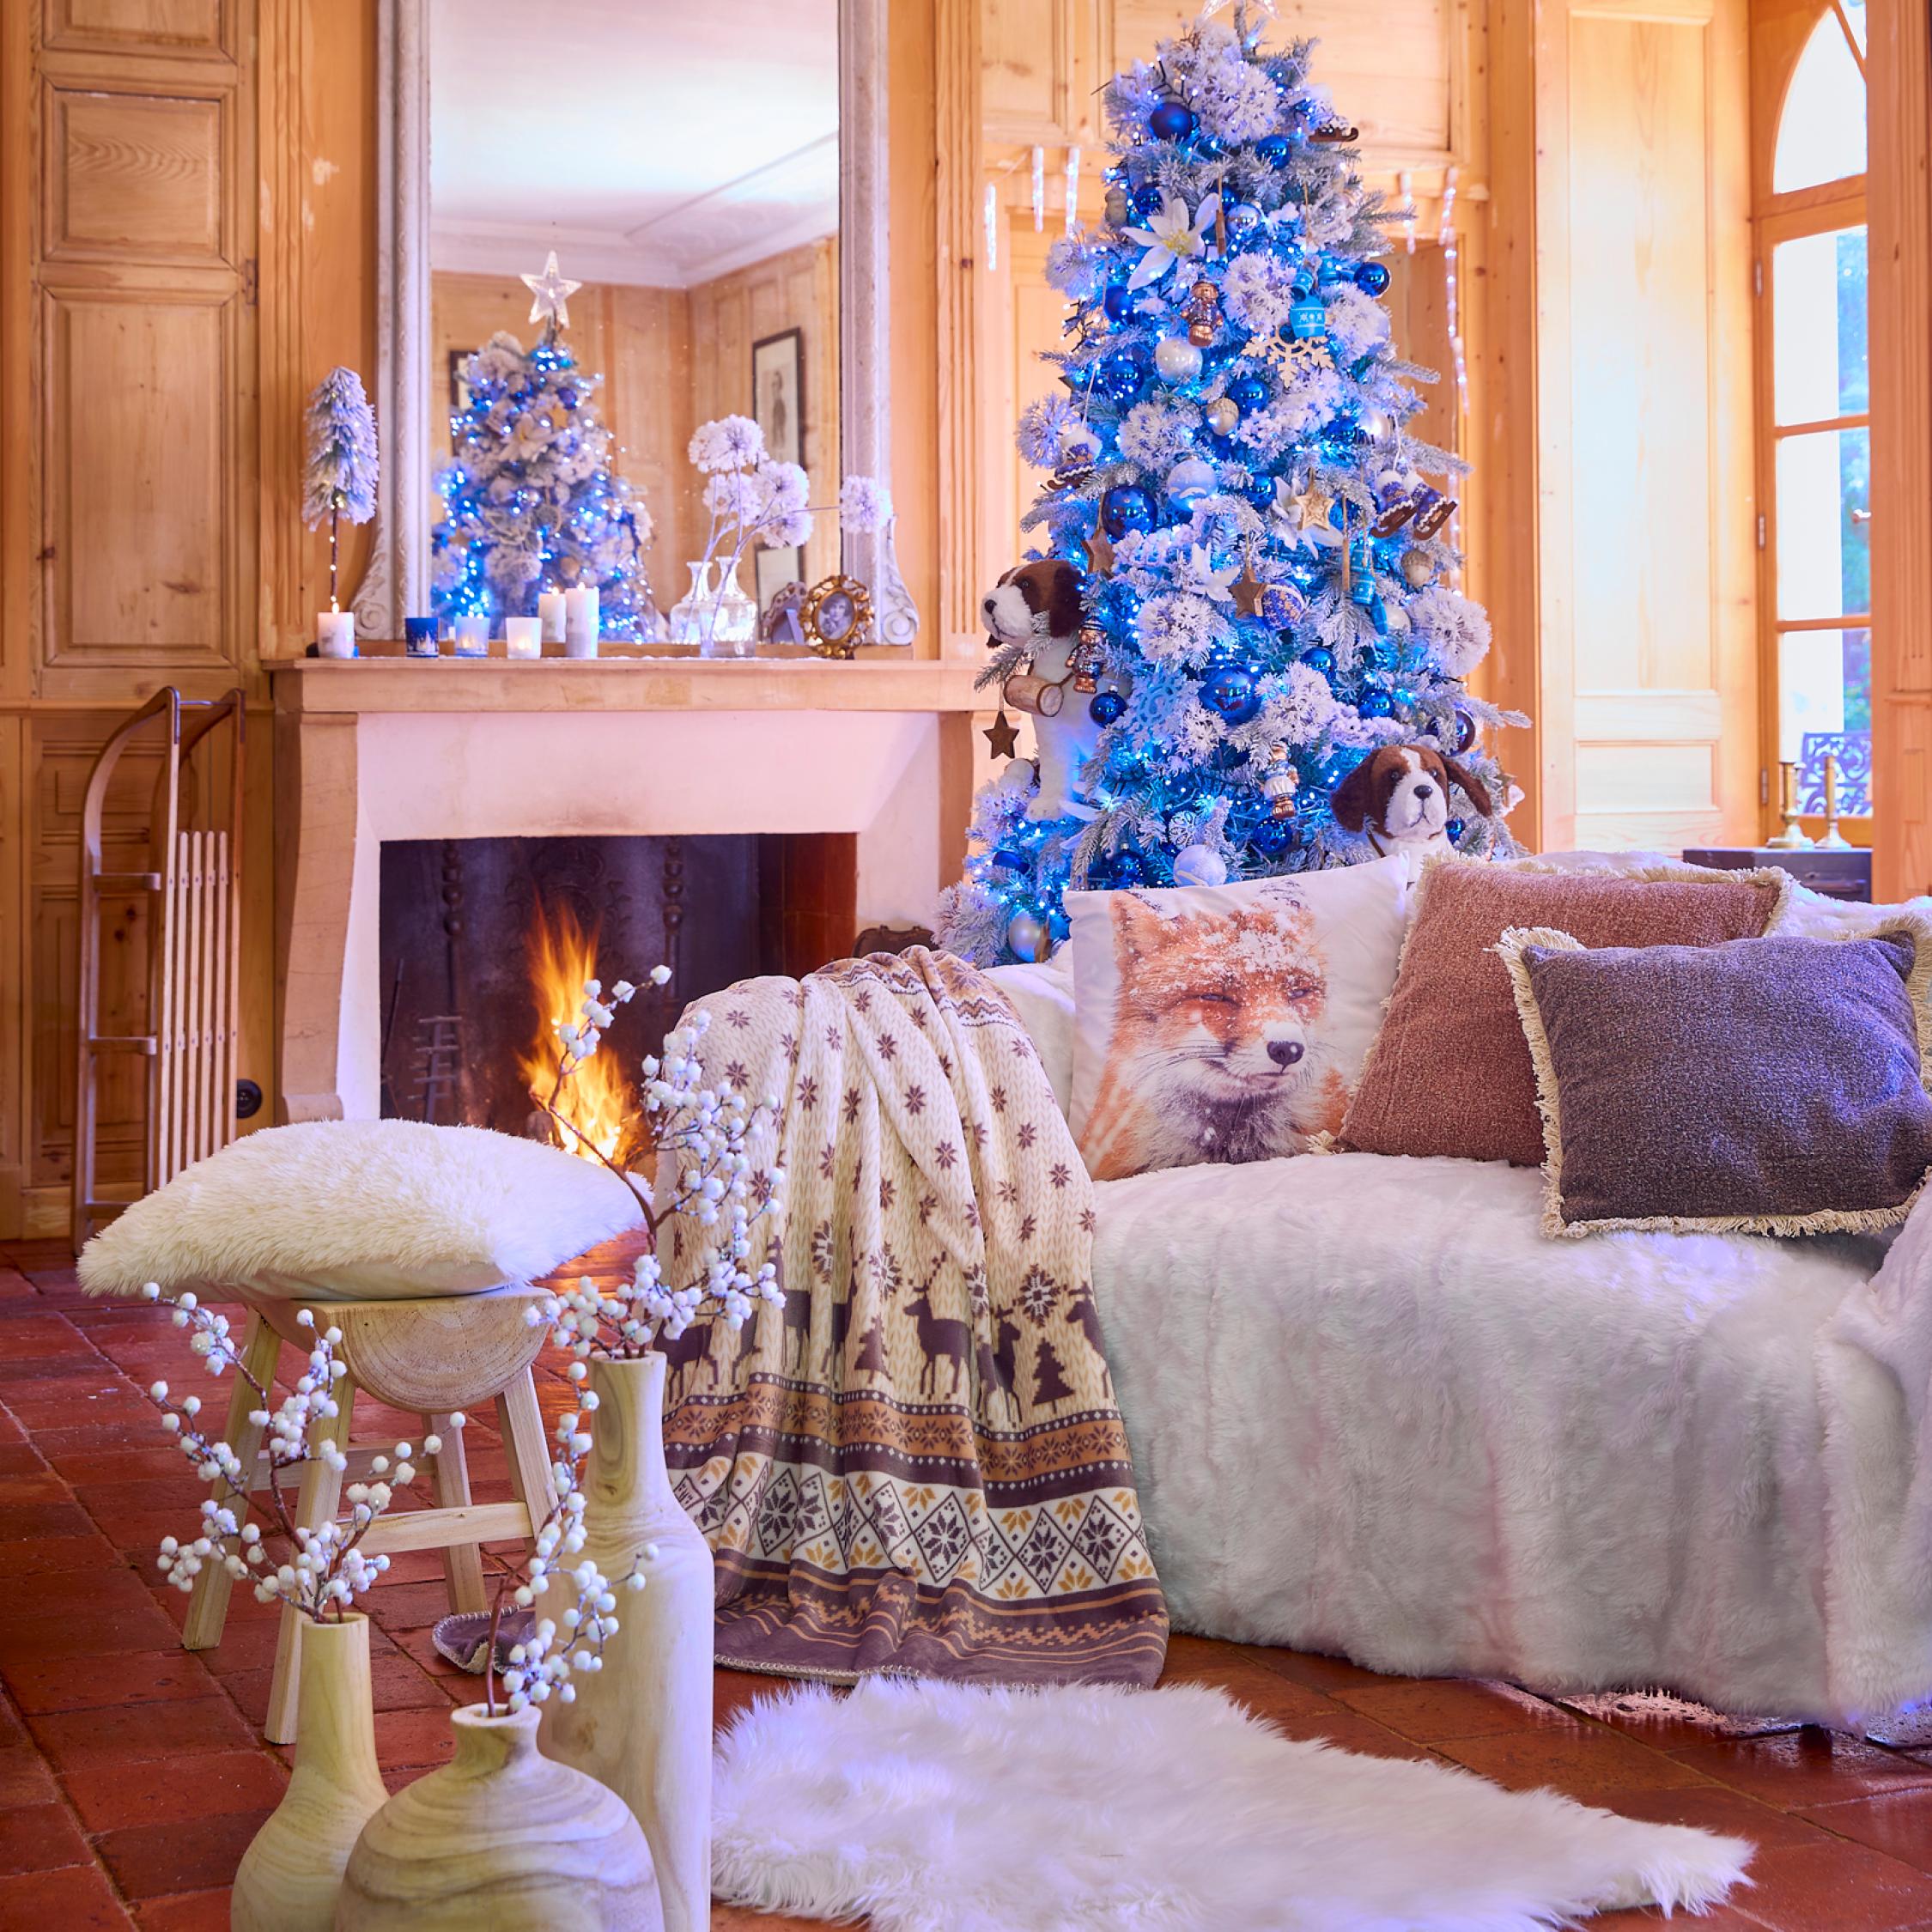 Deco Noel polaire blanc bleu